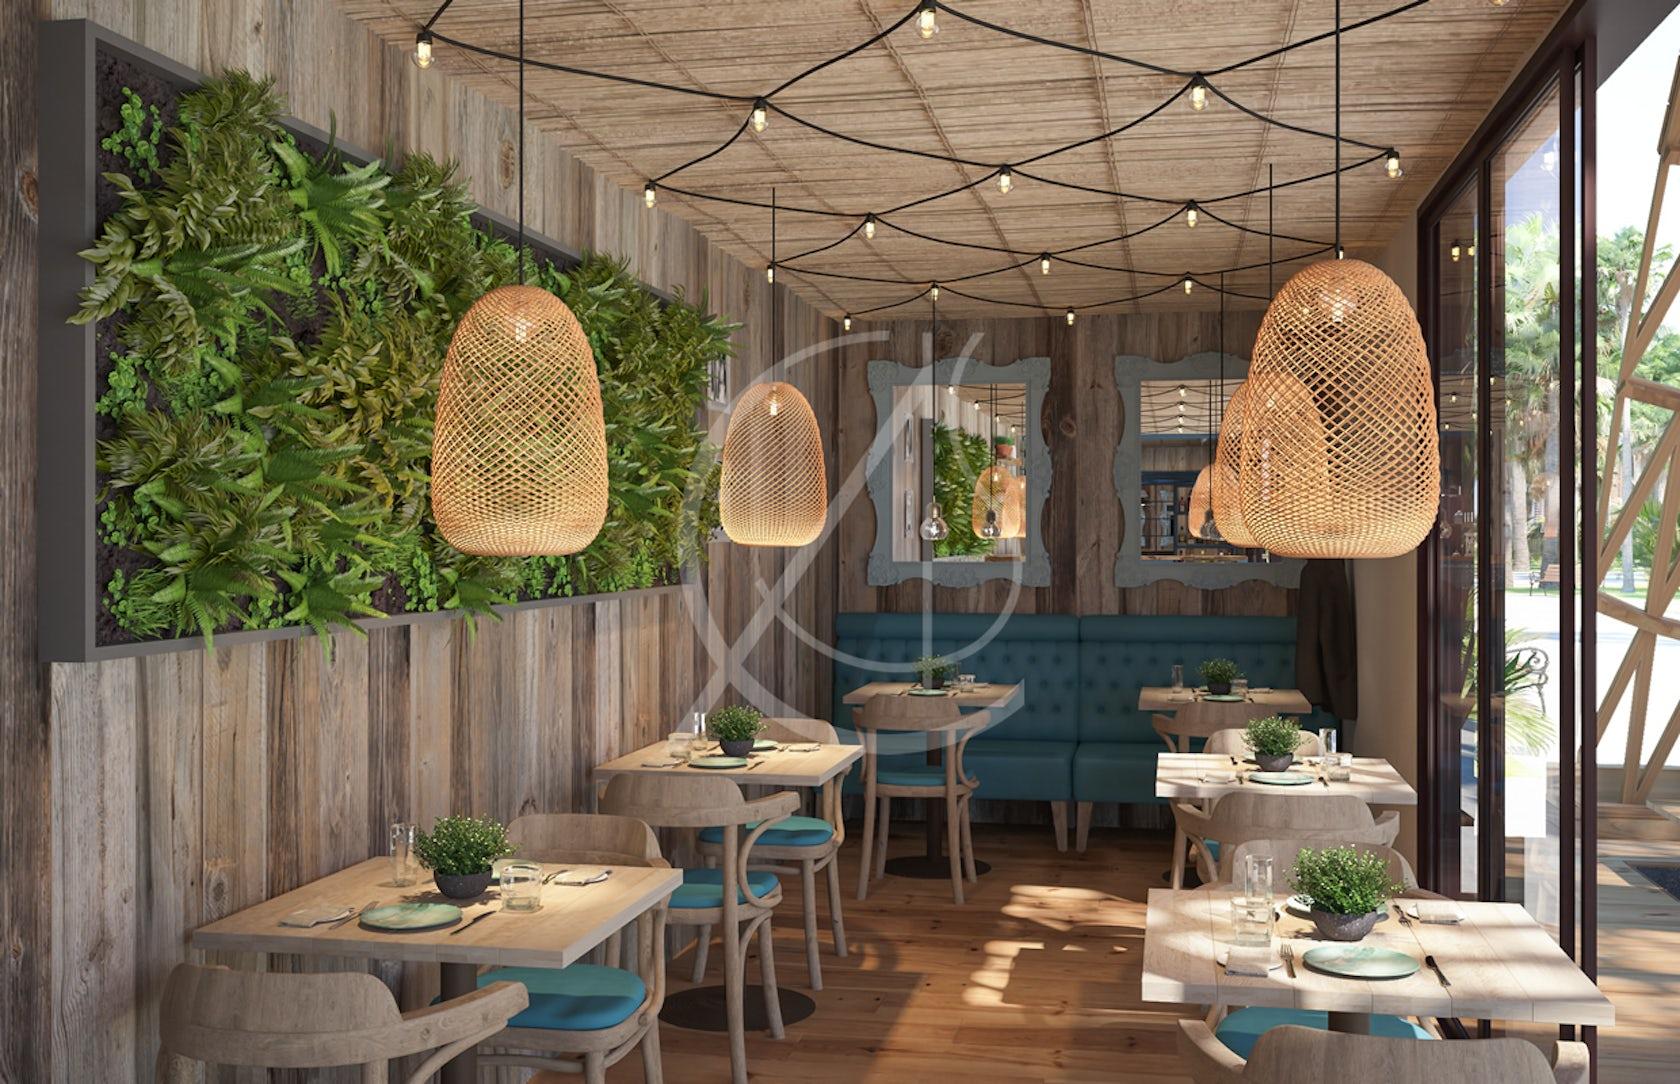 Ho yamal emirati eco friendly cafe container design